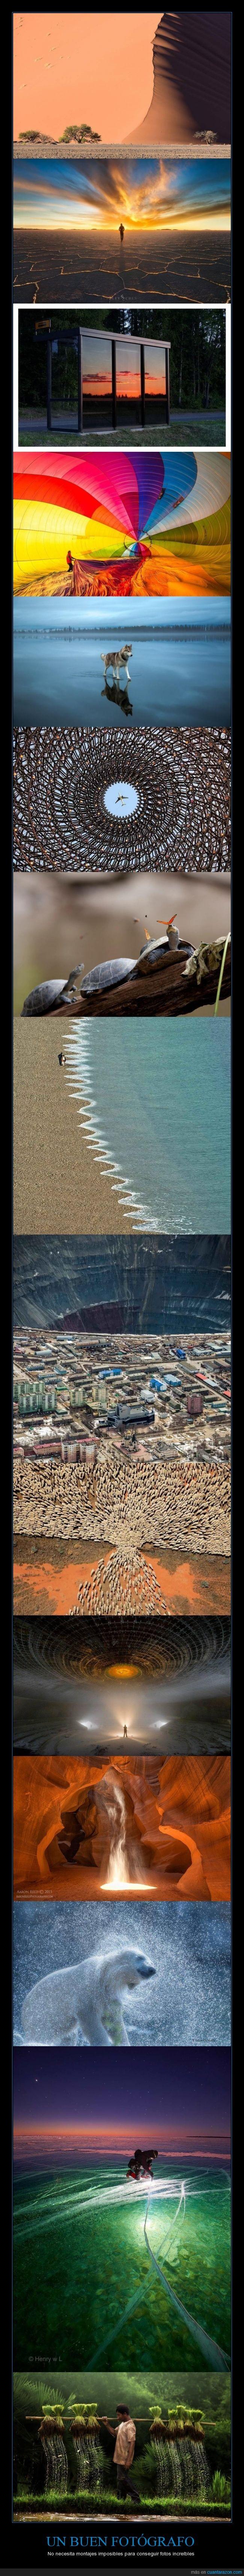 agua,arte,desierto,duna,fotografia,fotografo,hielo,mar,ola,oso polar,photop